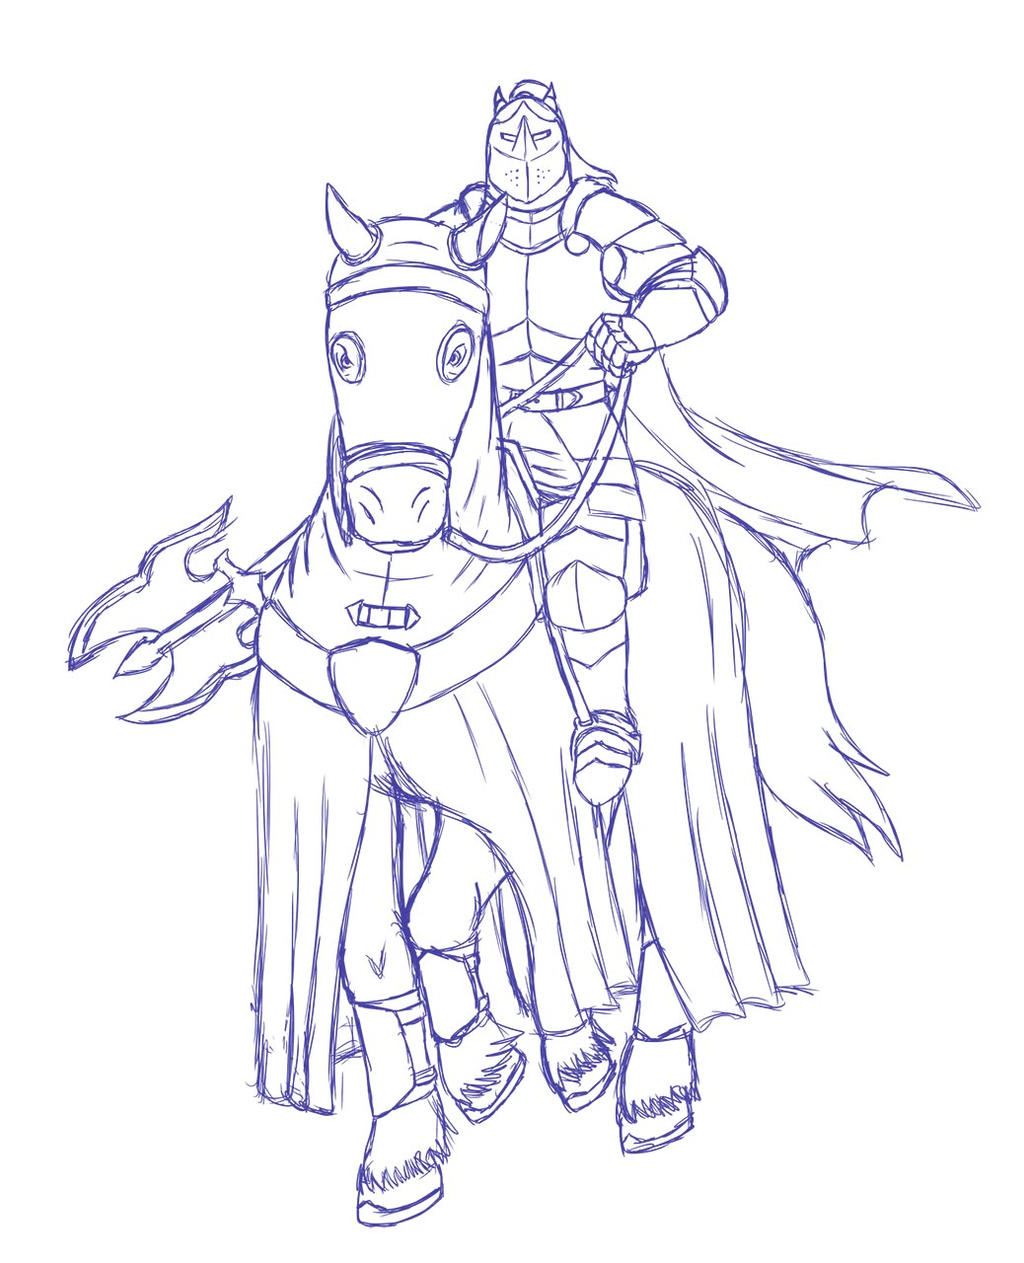 Lars on horse sketch